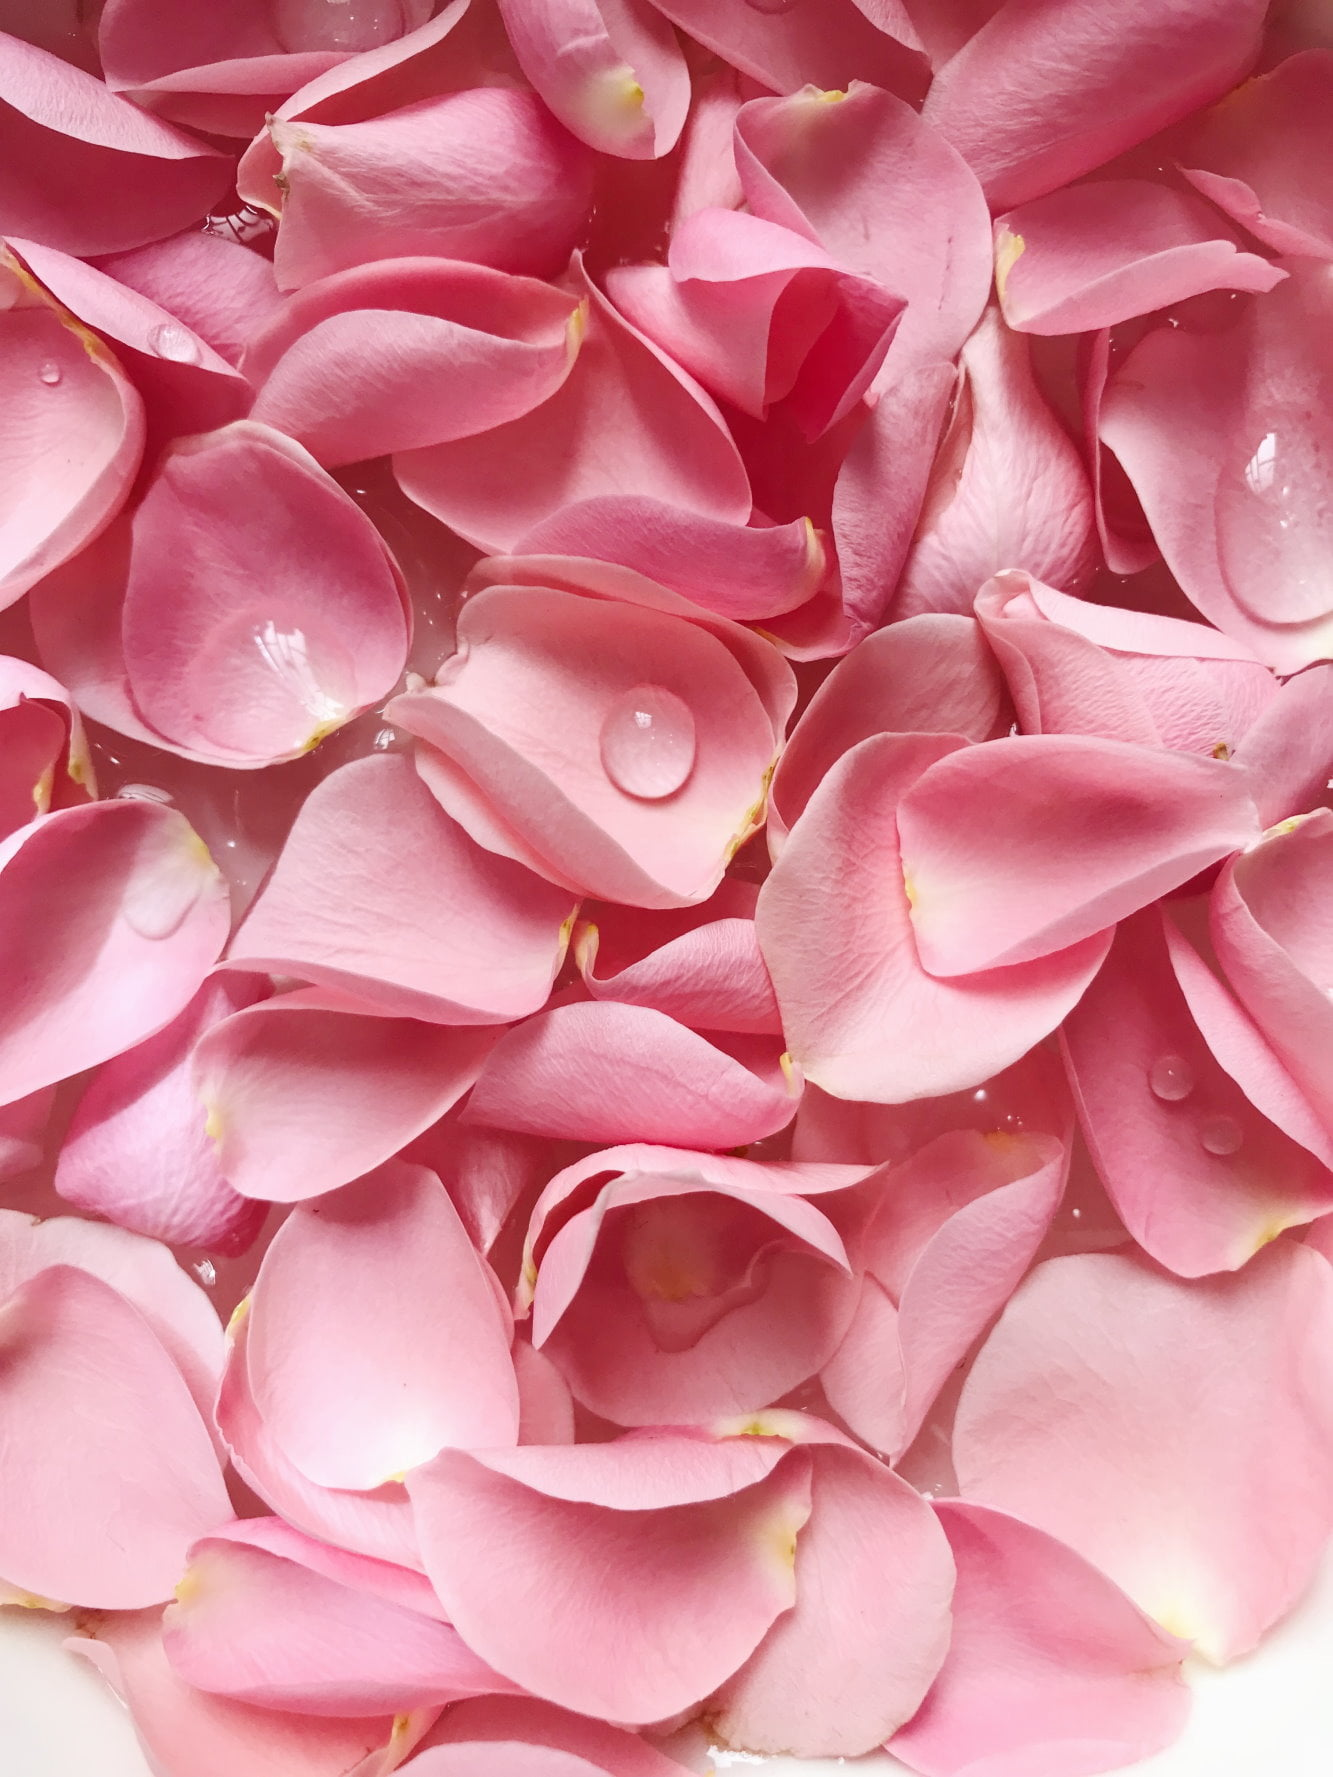 rosenblade